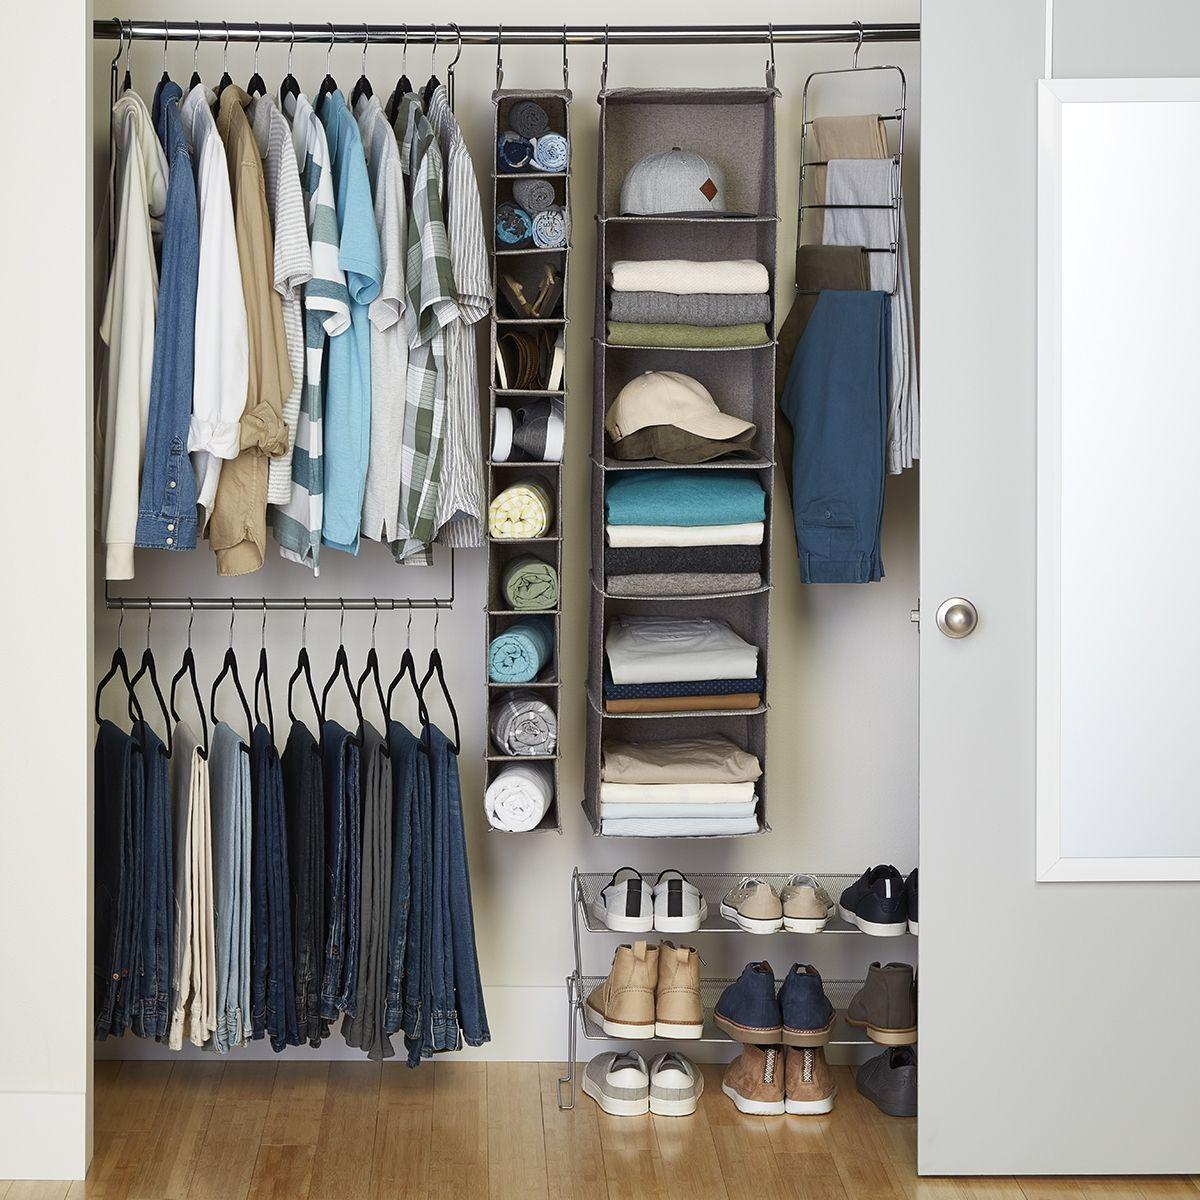 Small Closet No Problem Hanging Closet Organizers Are A Great